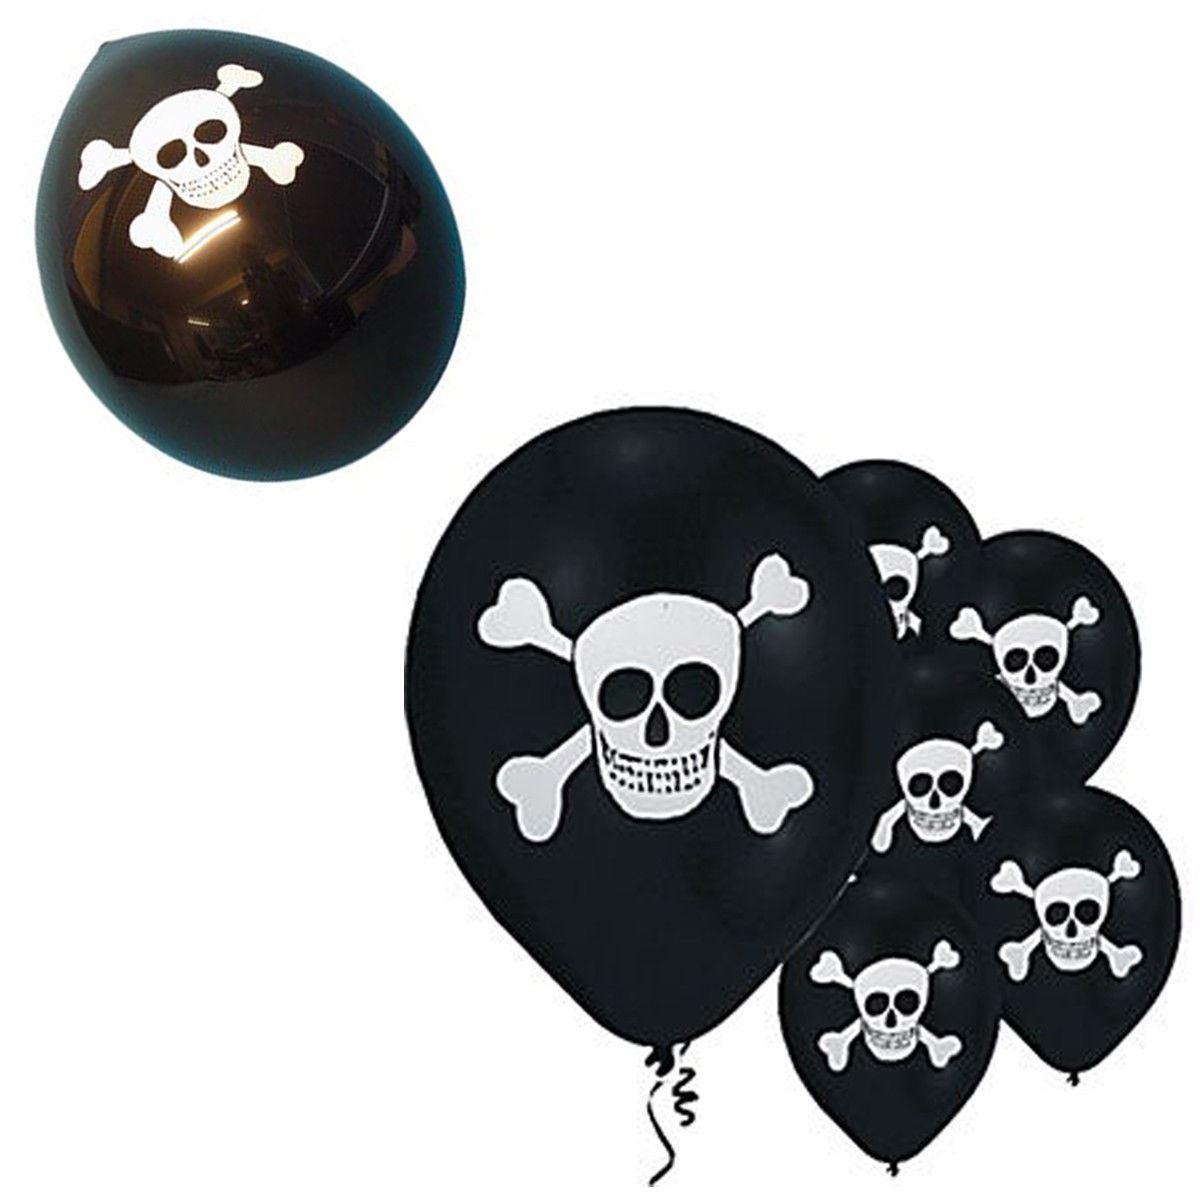 Halloween Balloons Spooky Decoration Black Orange Cobweb